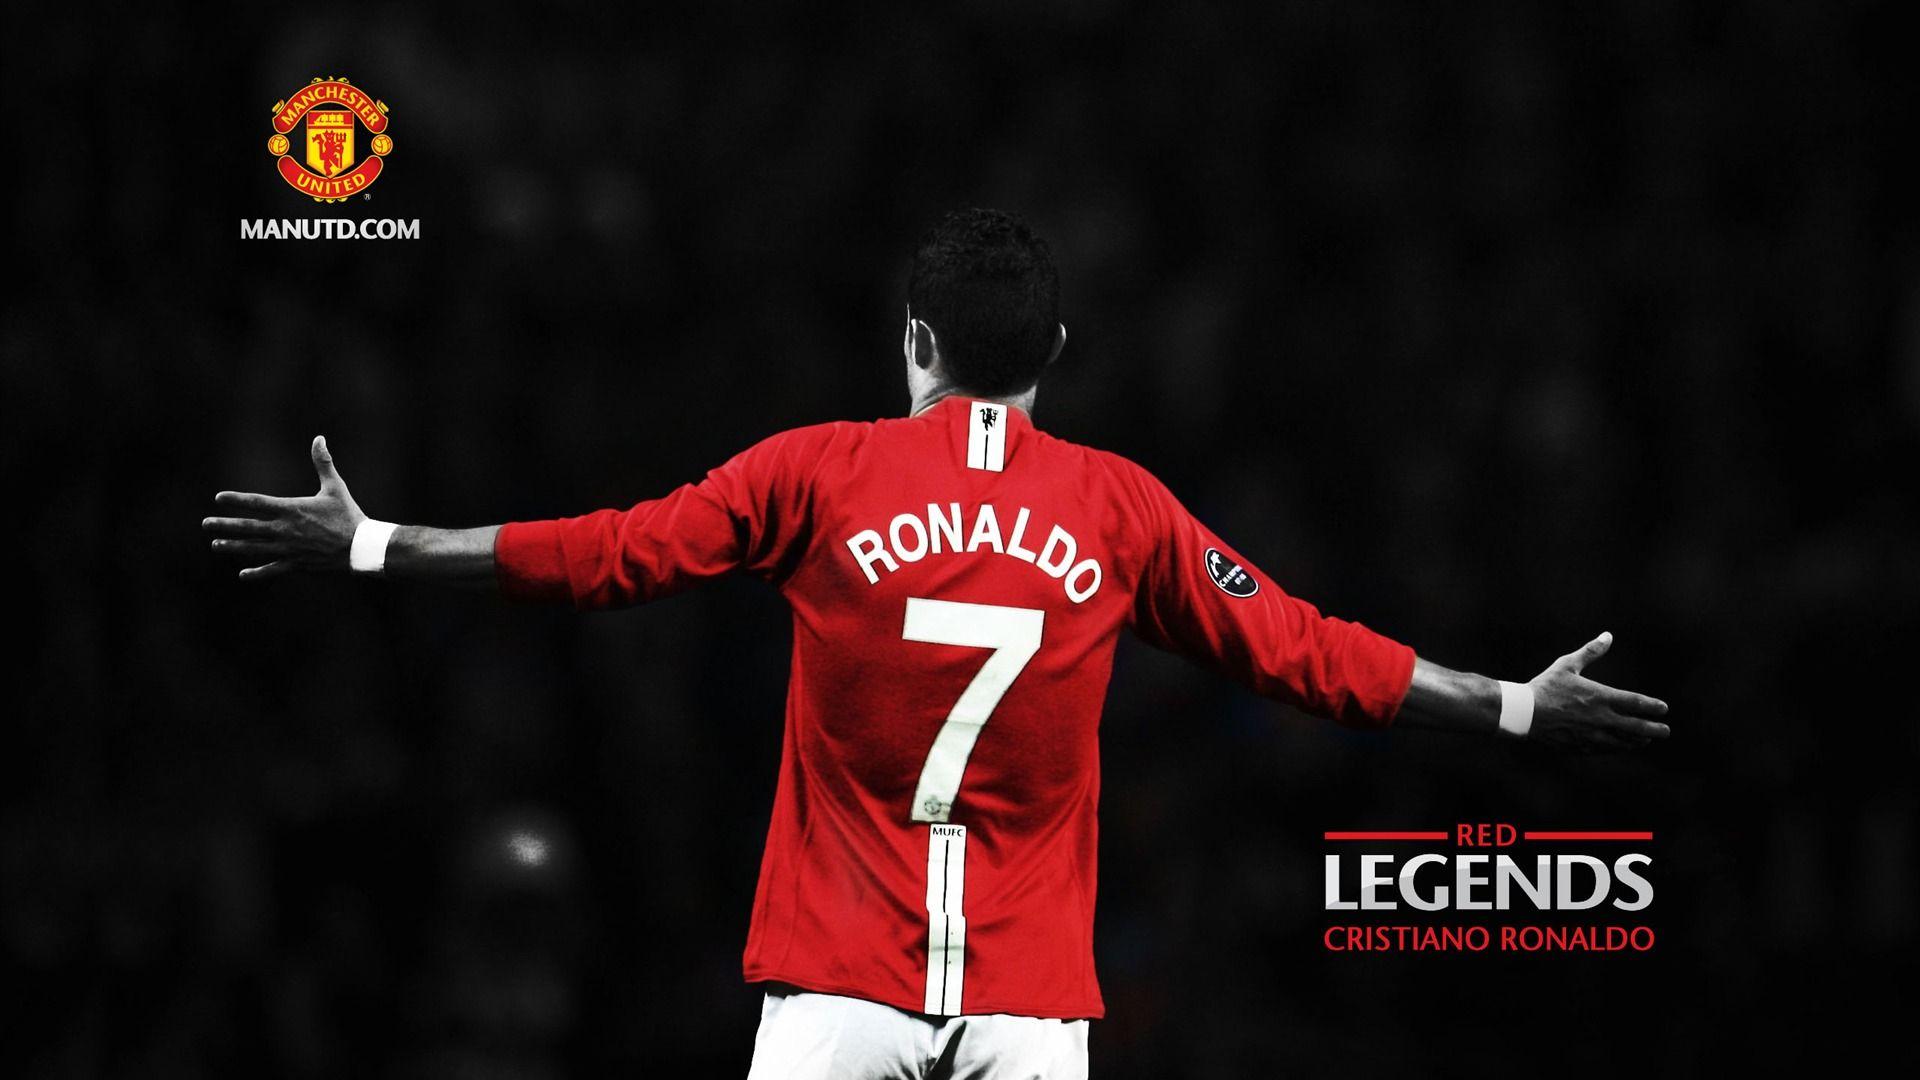 Cristiano Ronaldo Manchester United Hd Wallpaper football 1920x1080